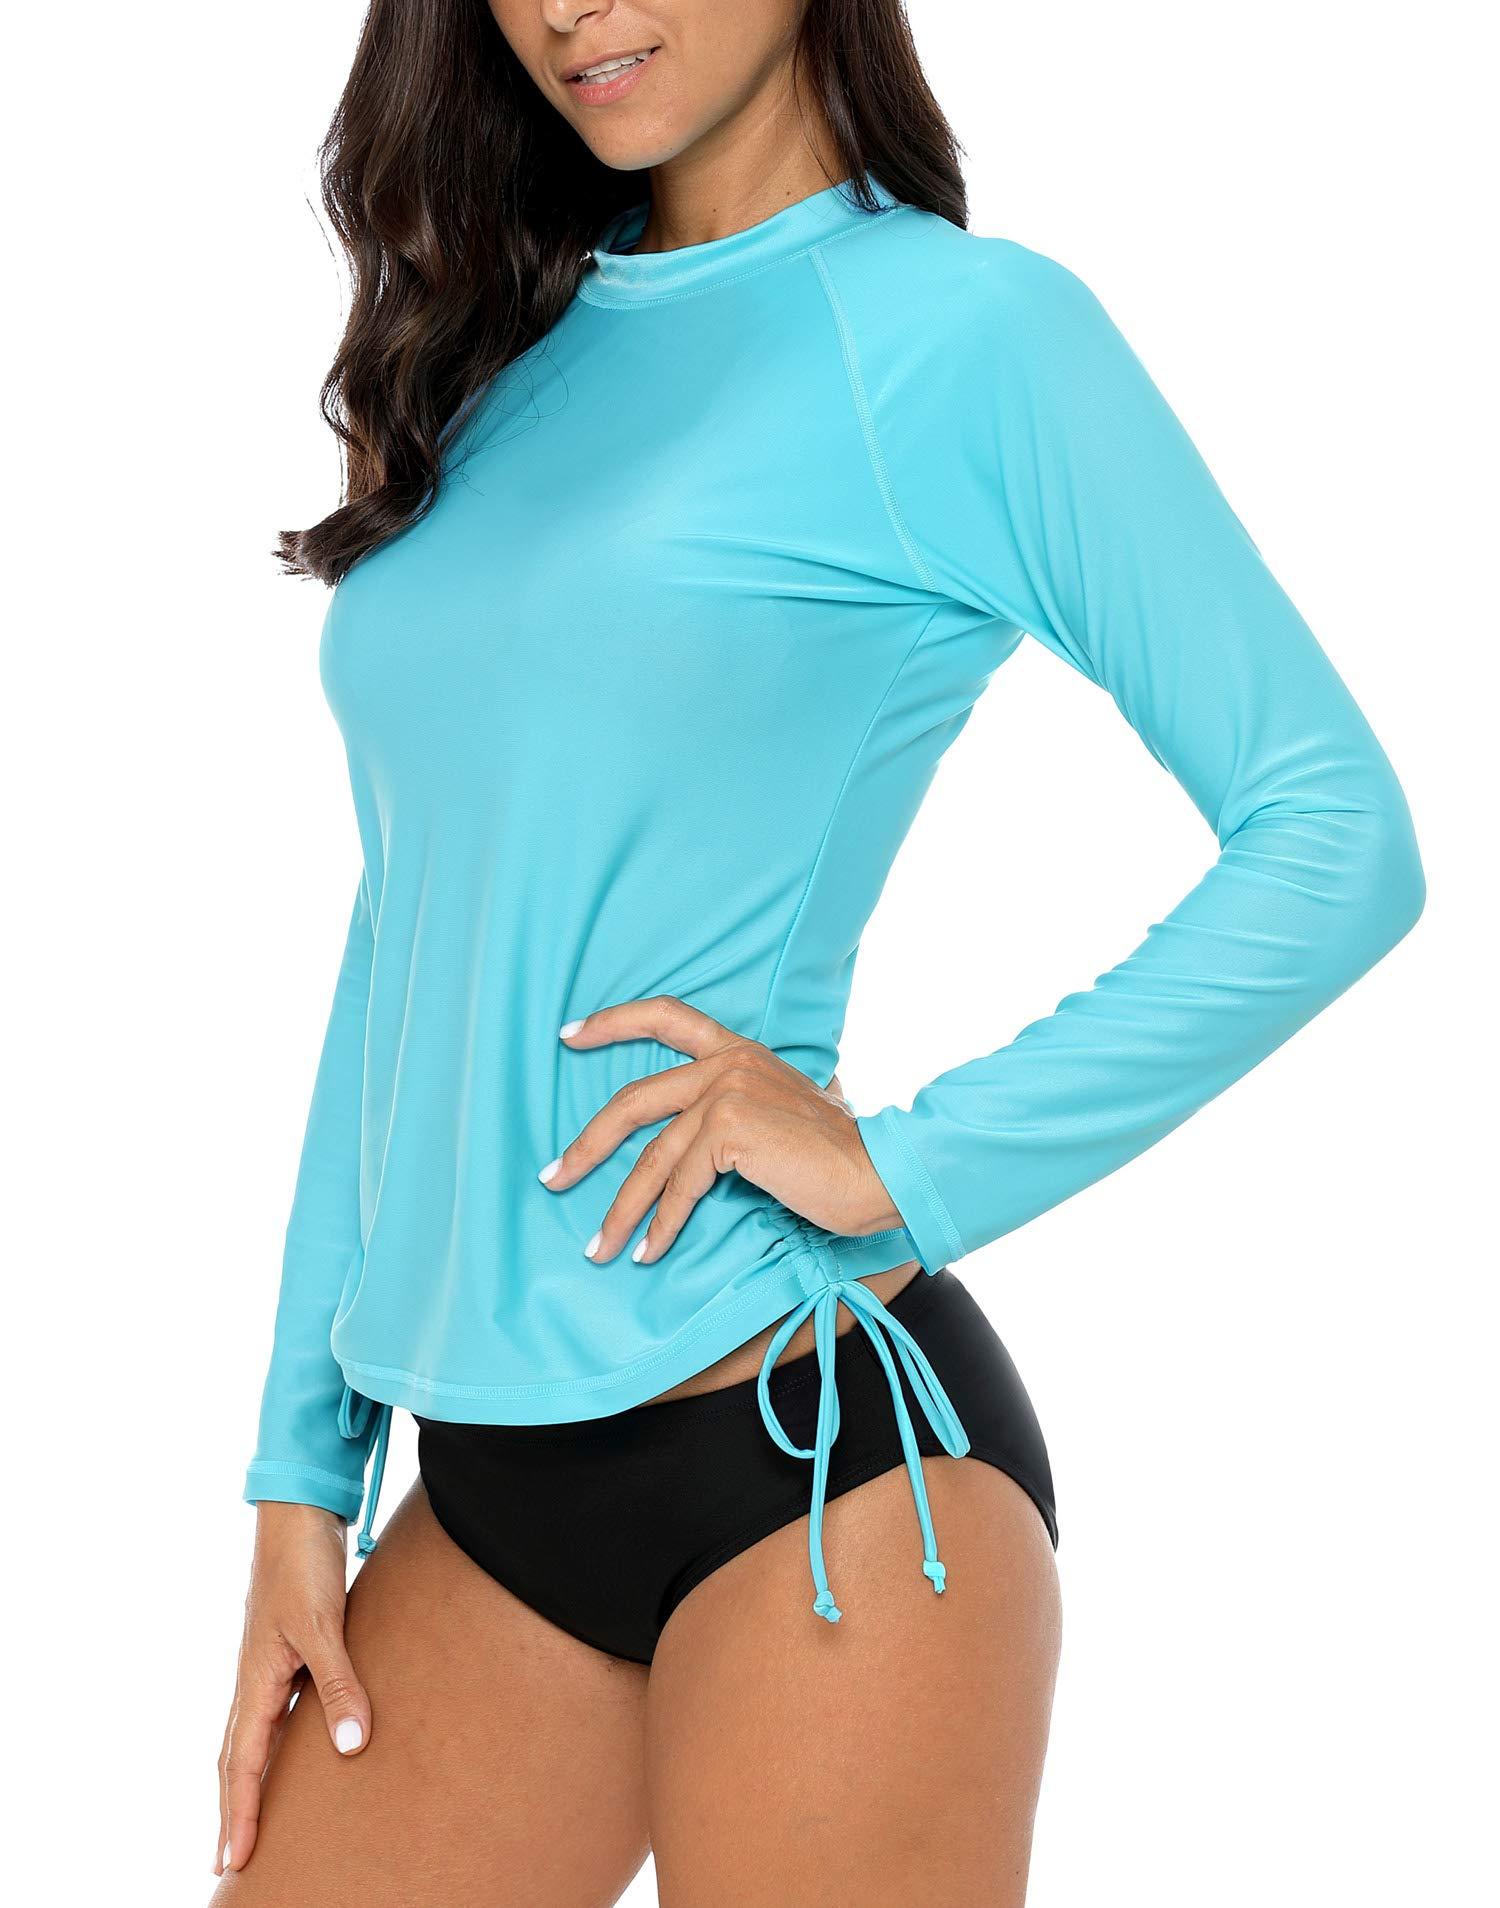 ALove Womens Drawstring Rash Guard Shirt UV Protection Swim Shirts Aqua M by ALove (Image #6)